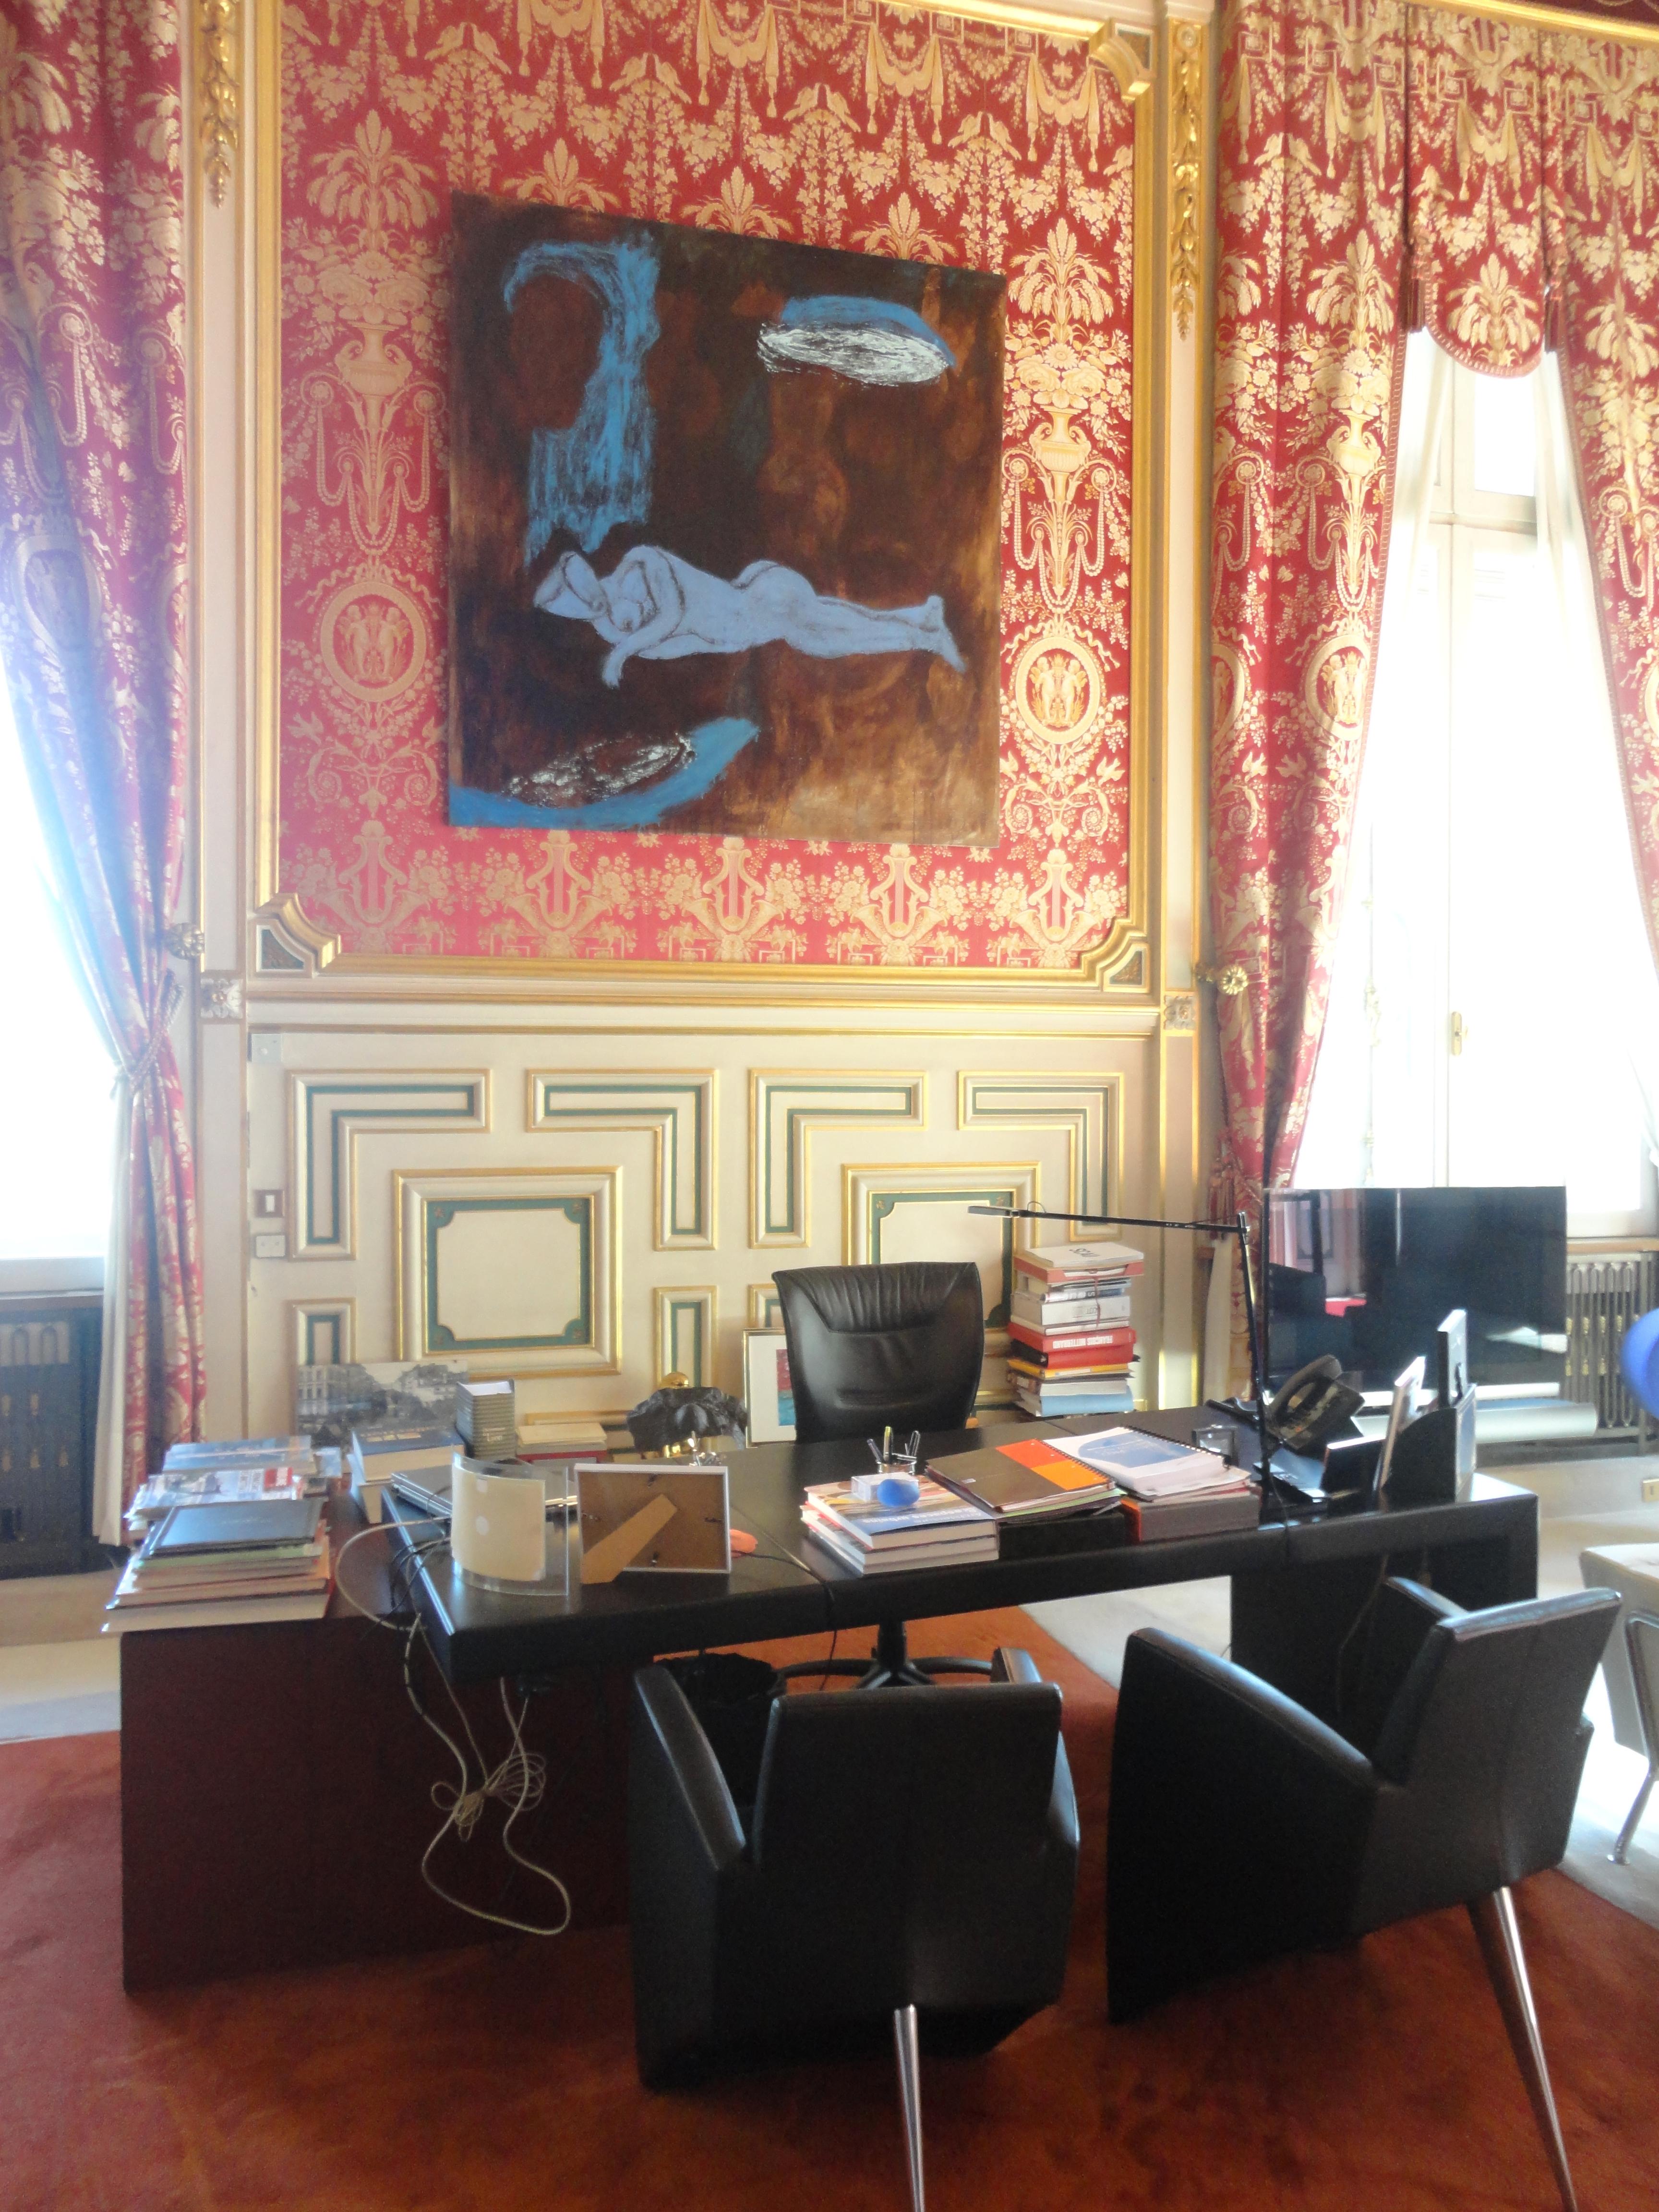 file bureau maire lyon 2 jpg wikimedia commons. Black Bedroom Furniture Sets. Home Design Ideas